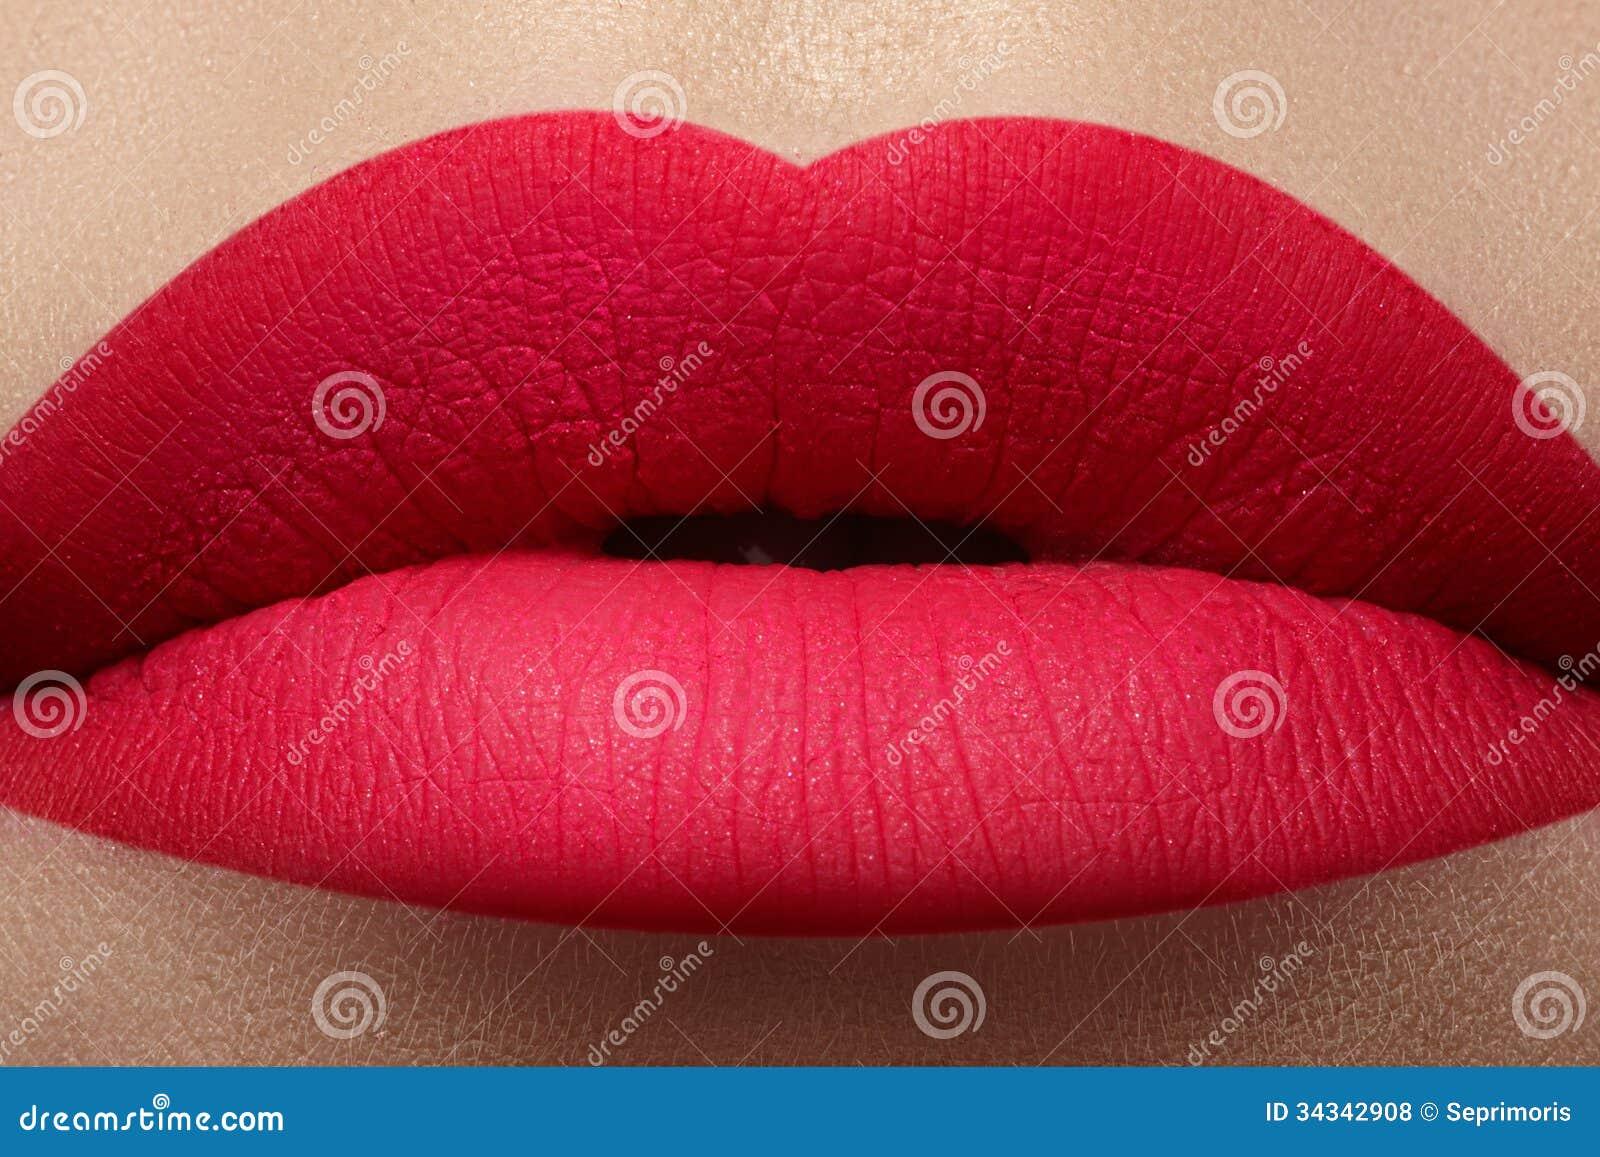 Cosmetic. Glamour fashion bright pink lips mat make-up